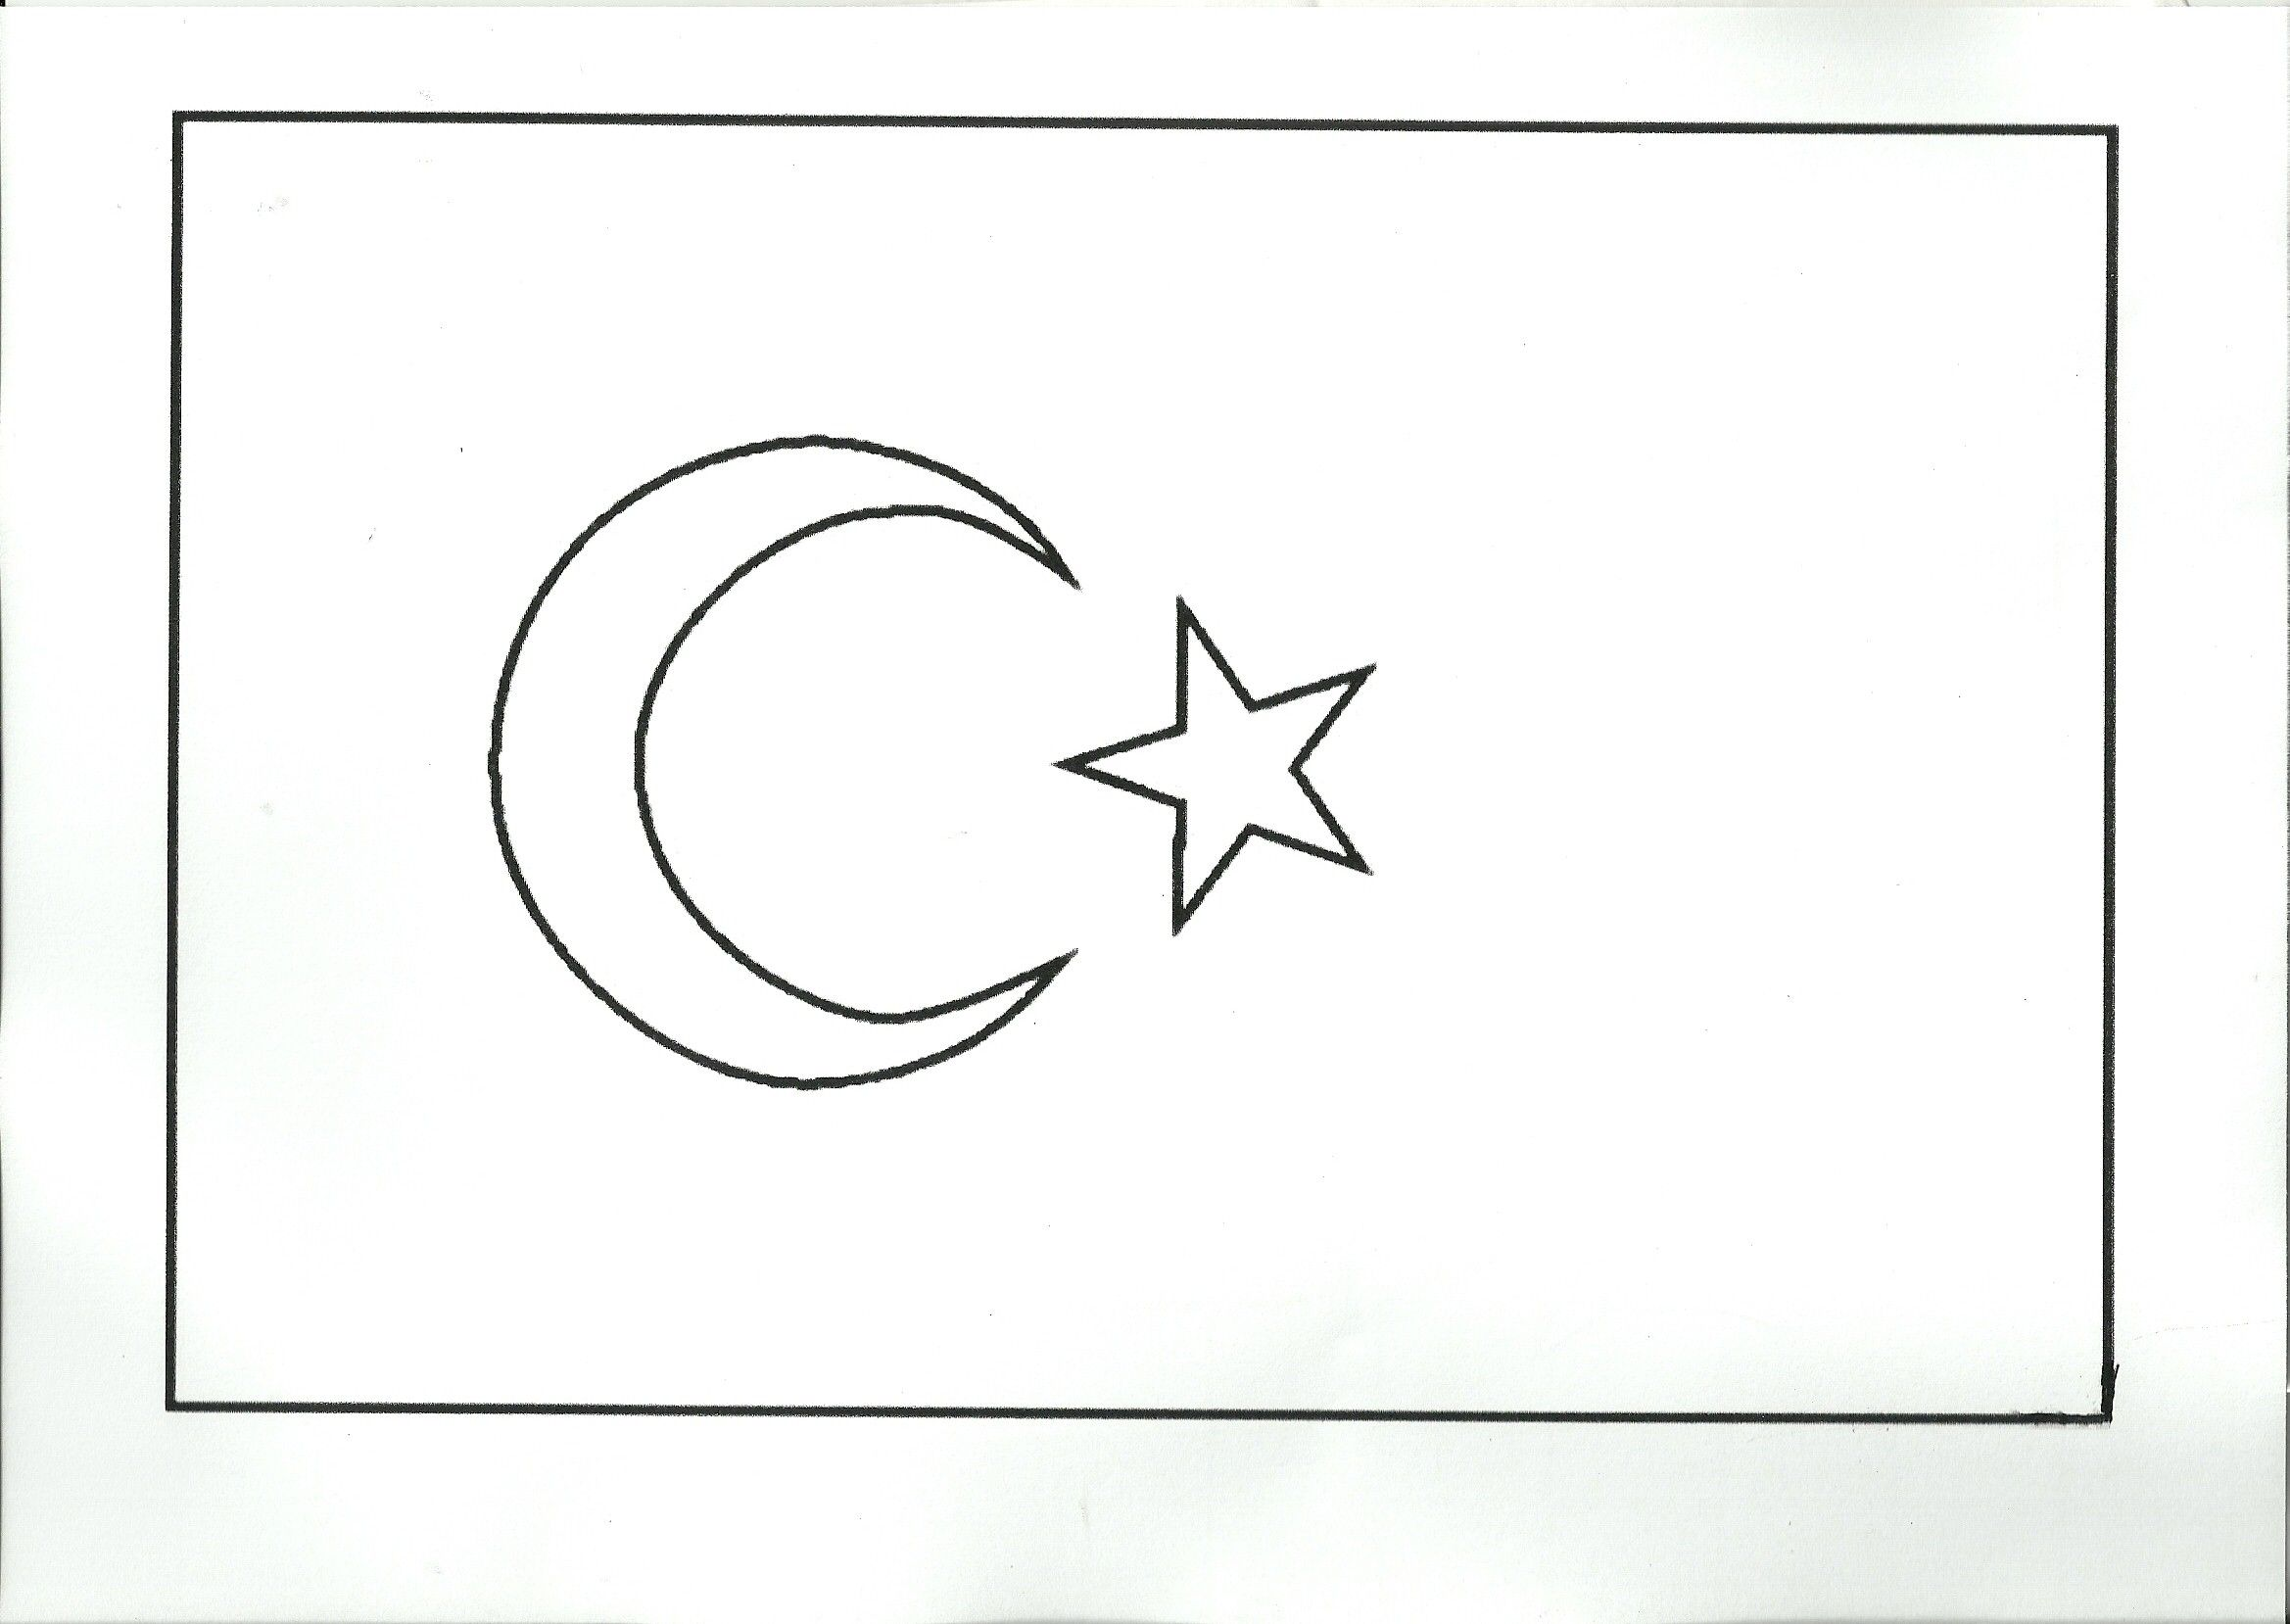 Dilek Yilmaz Erkoc Adli Kullanicinin Okulumm Panosundaki Pin